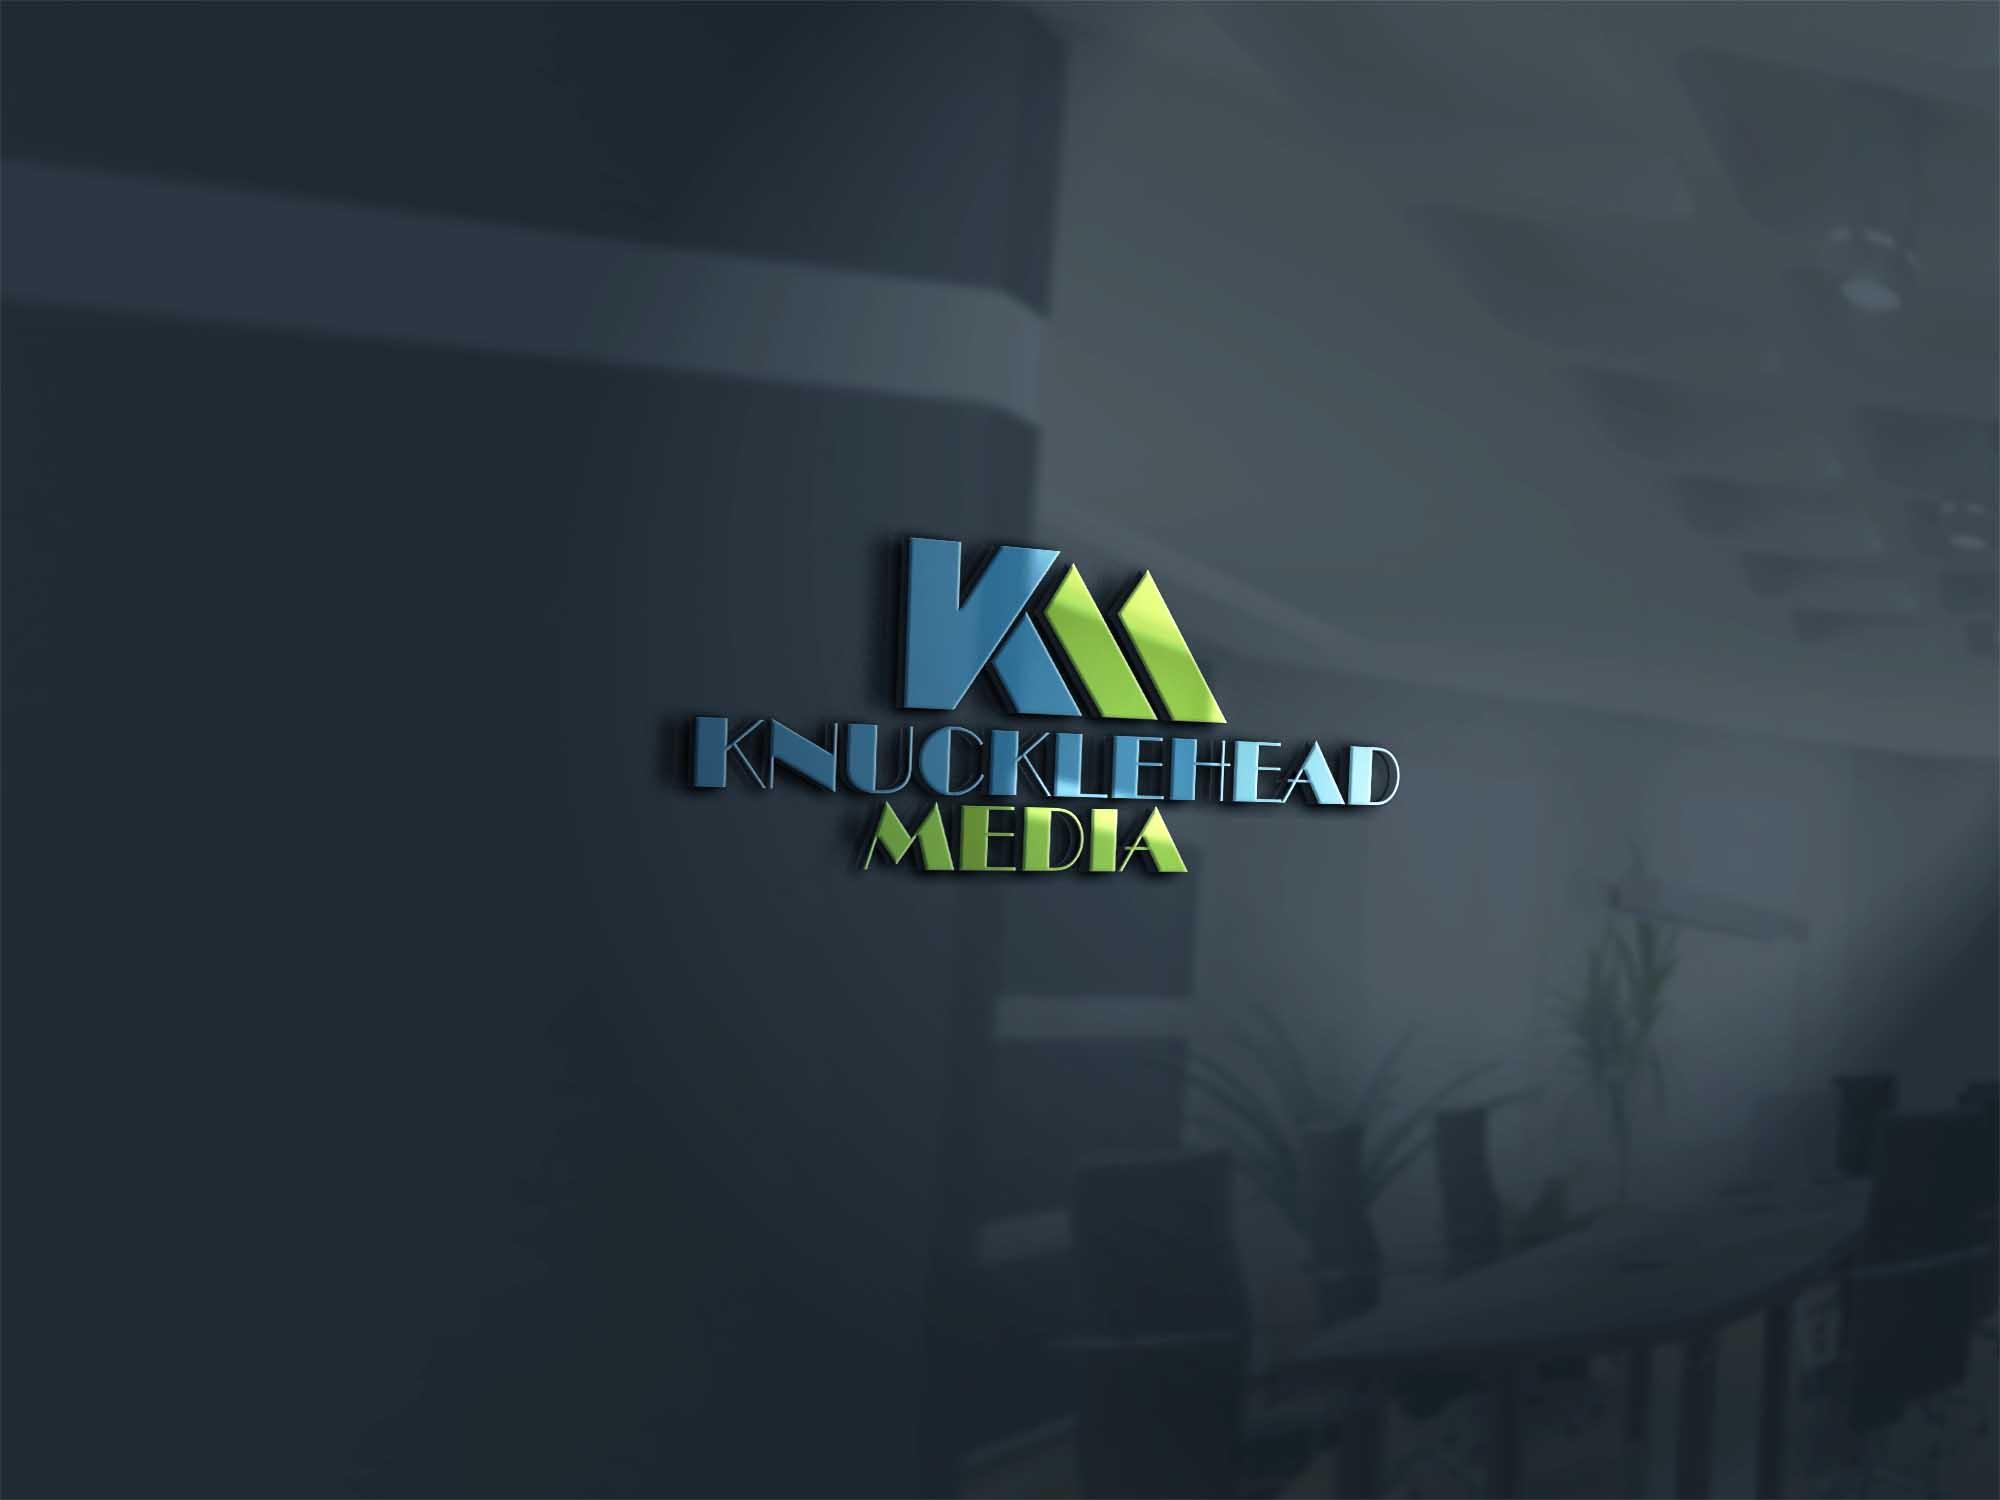 Logo Design by brands_in - Entry No. 71 in the Logo Design Contest Imaginative Logo Design for knucklehead media.